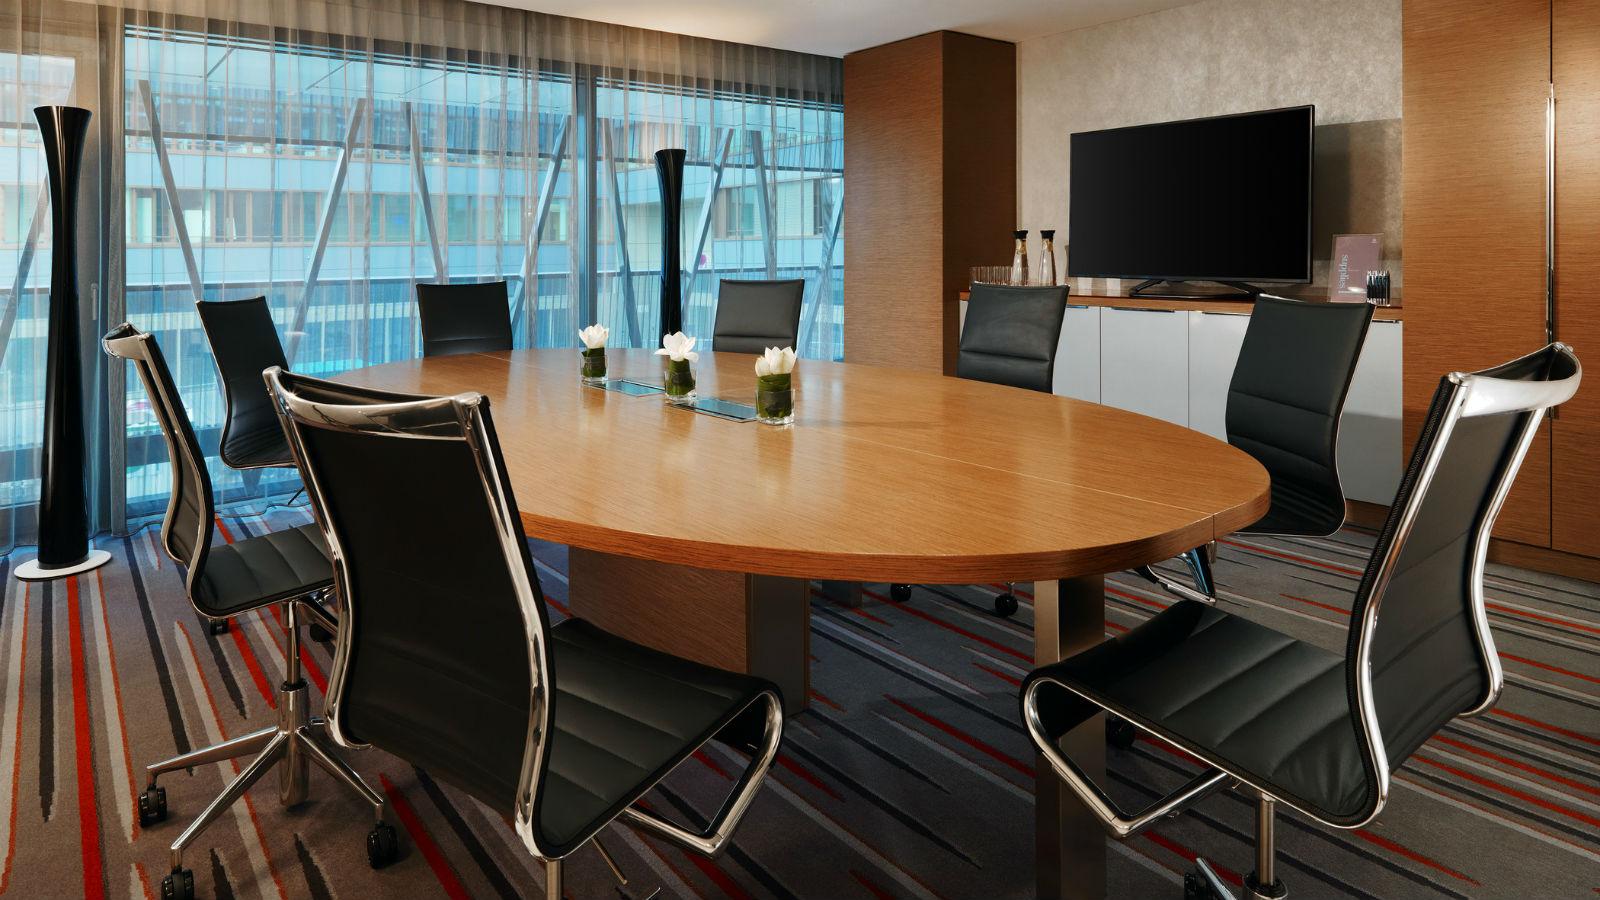 3732-Sheraton-Zurich-Hotel-Meeting-Boardroom-Kreis-5-1600x900